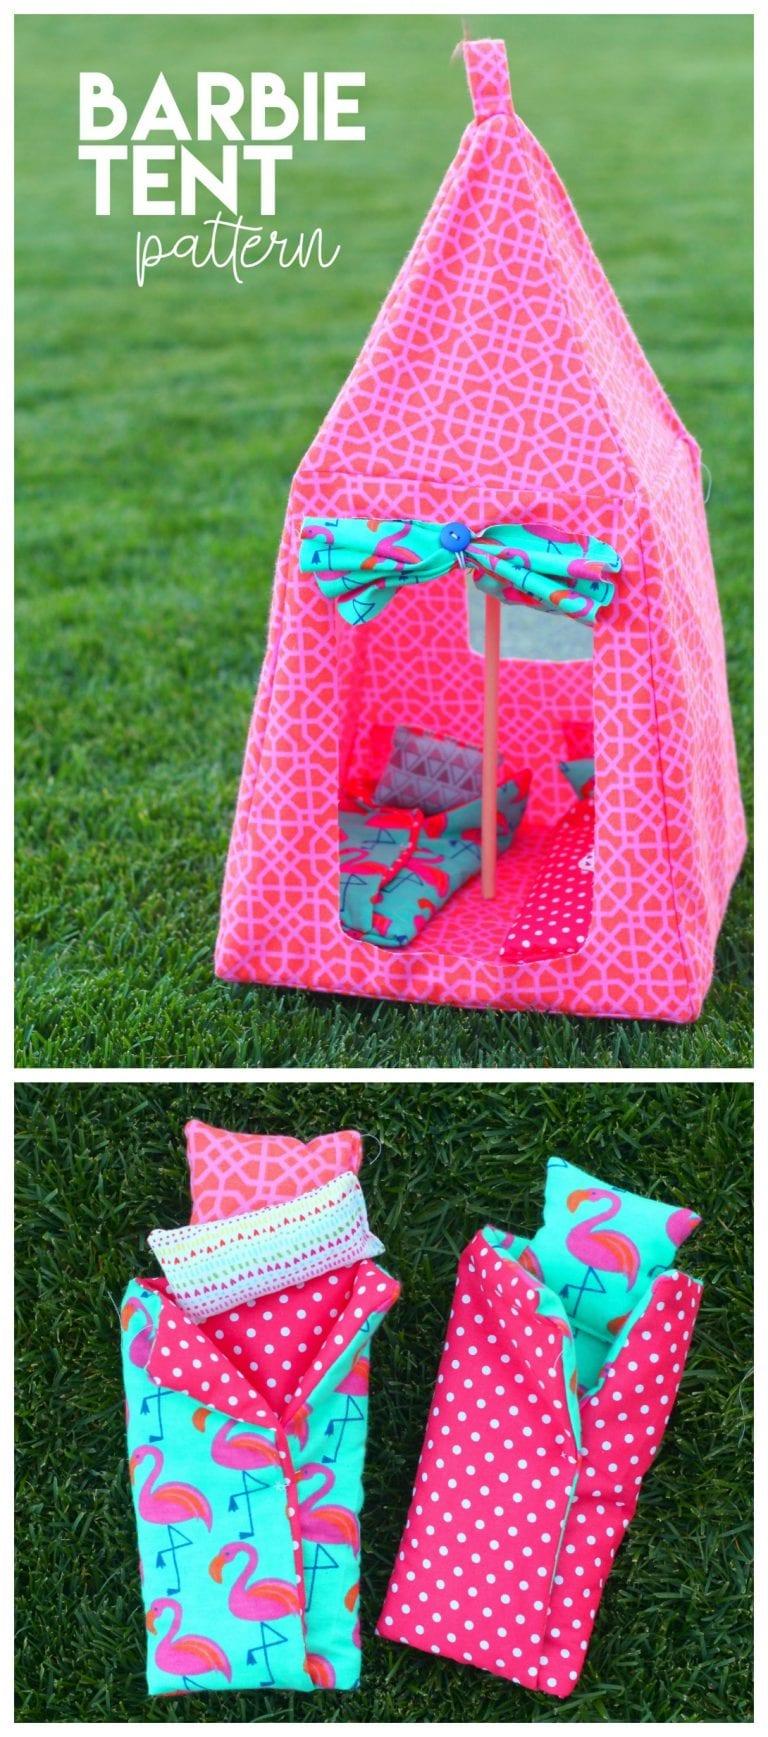 Barbie Tent Pattern #barbiefurniture